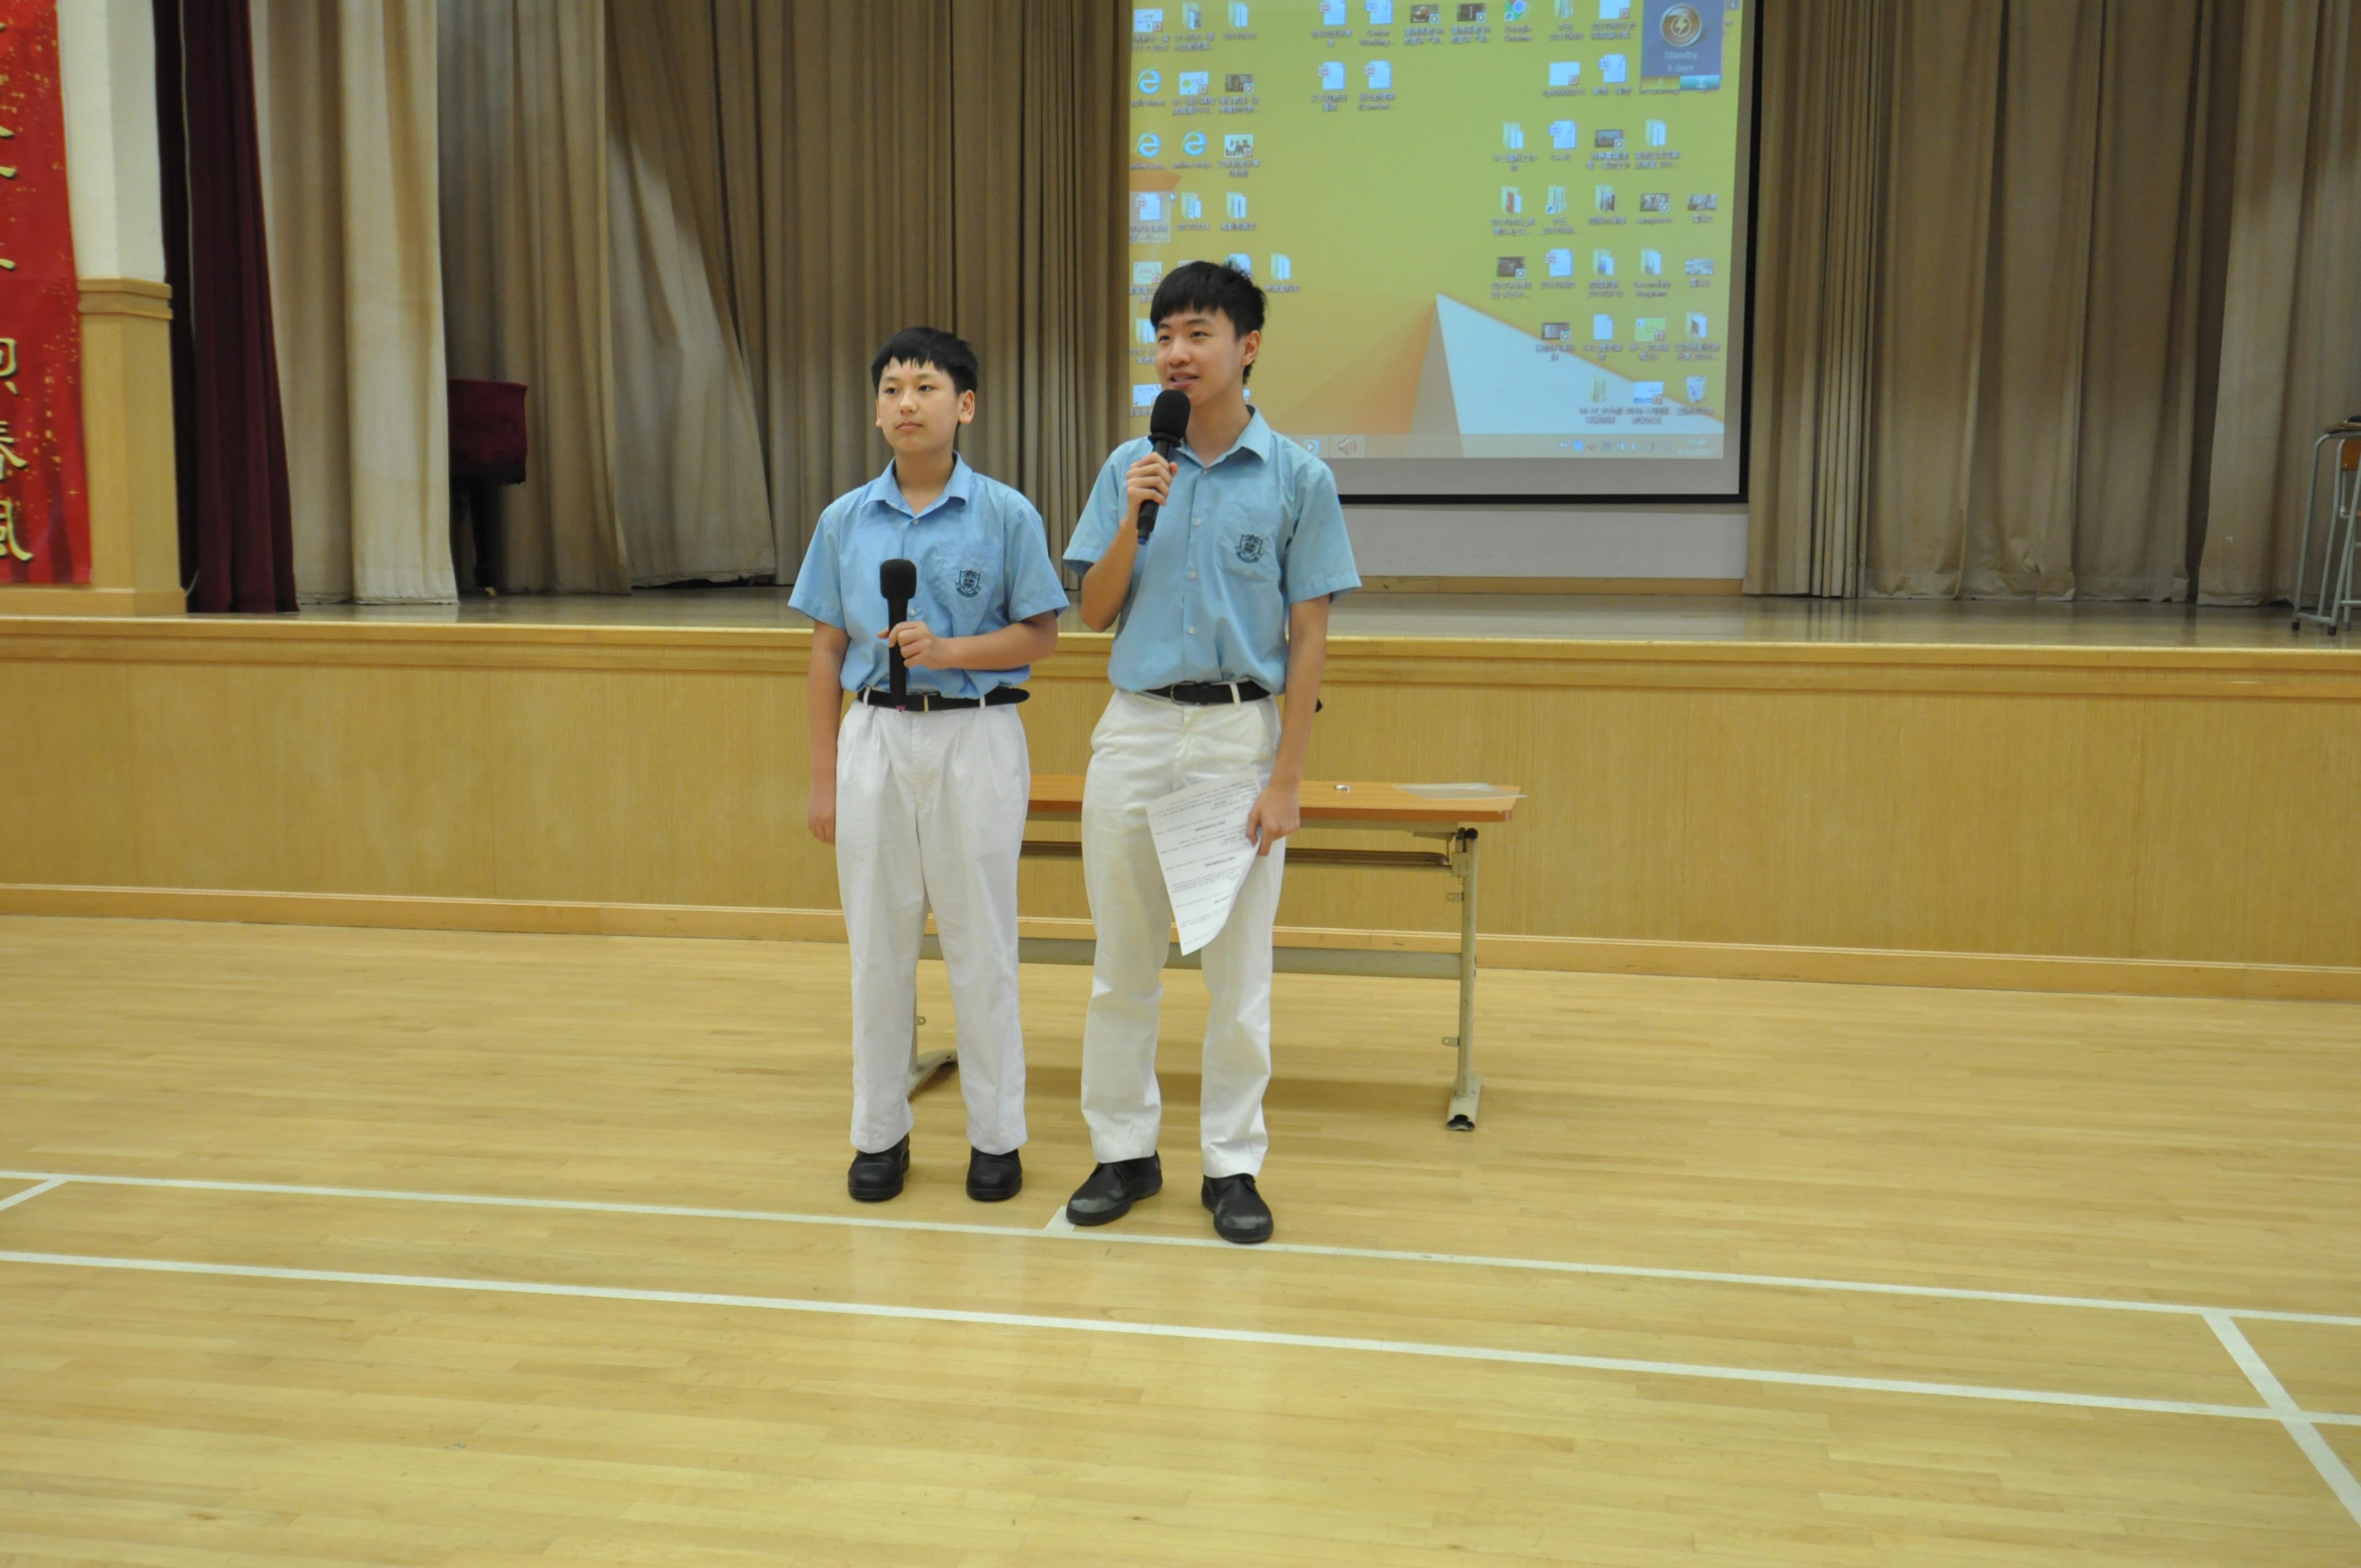 http://www.npc.edu.hk/sites/default/files/dsc_0035.jpg